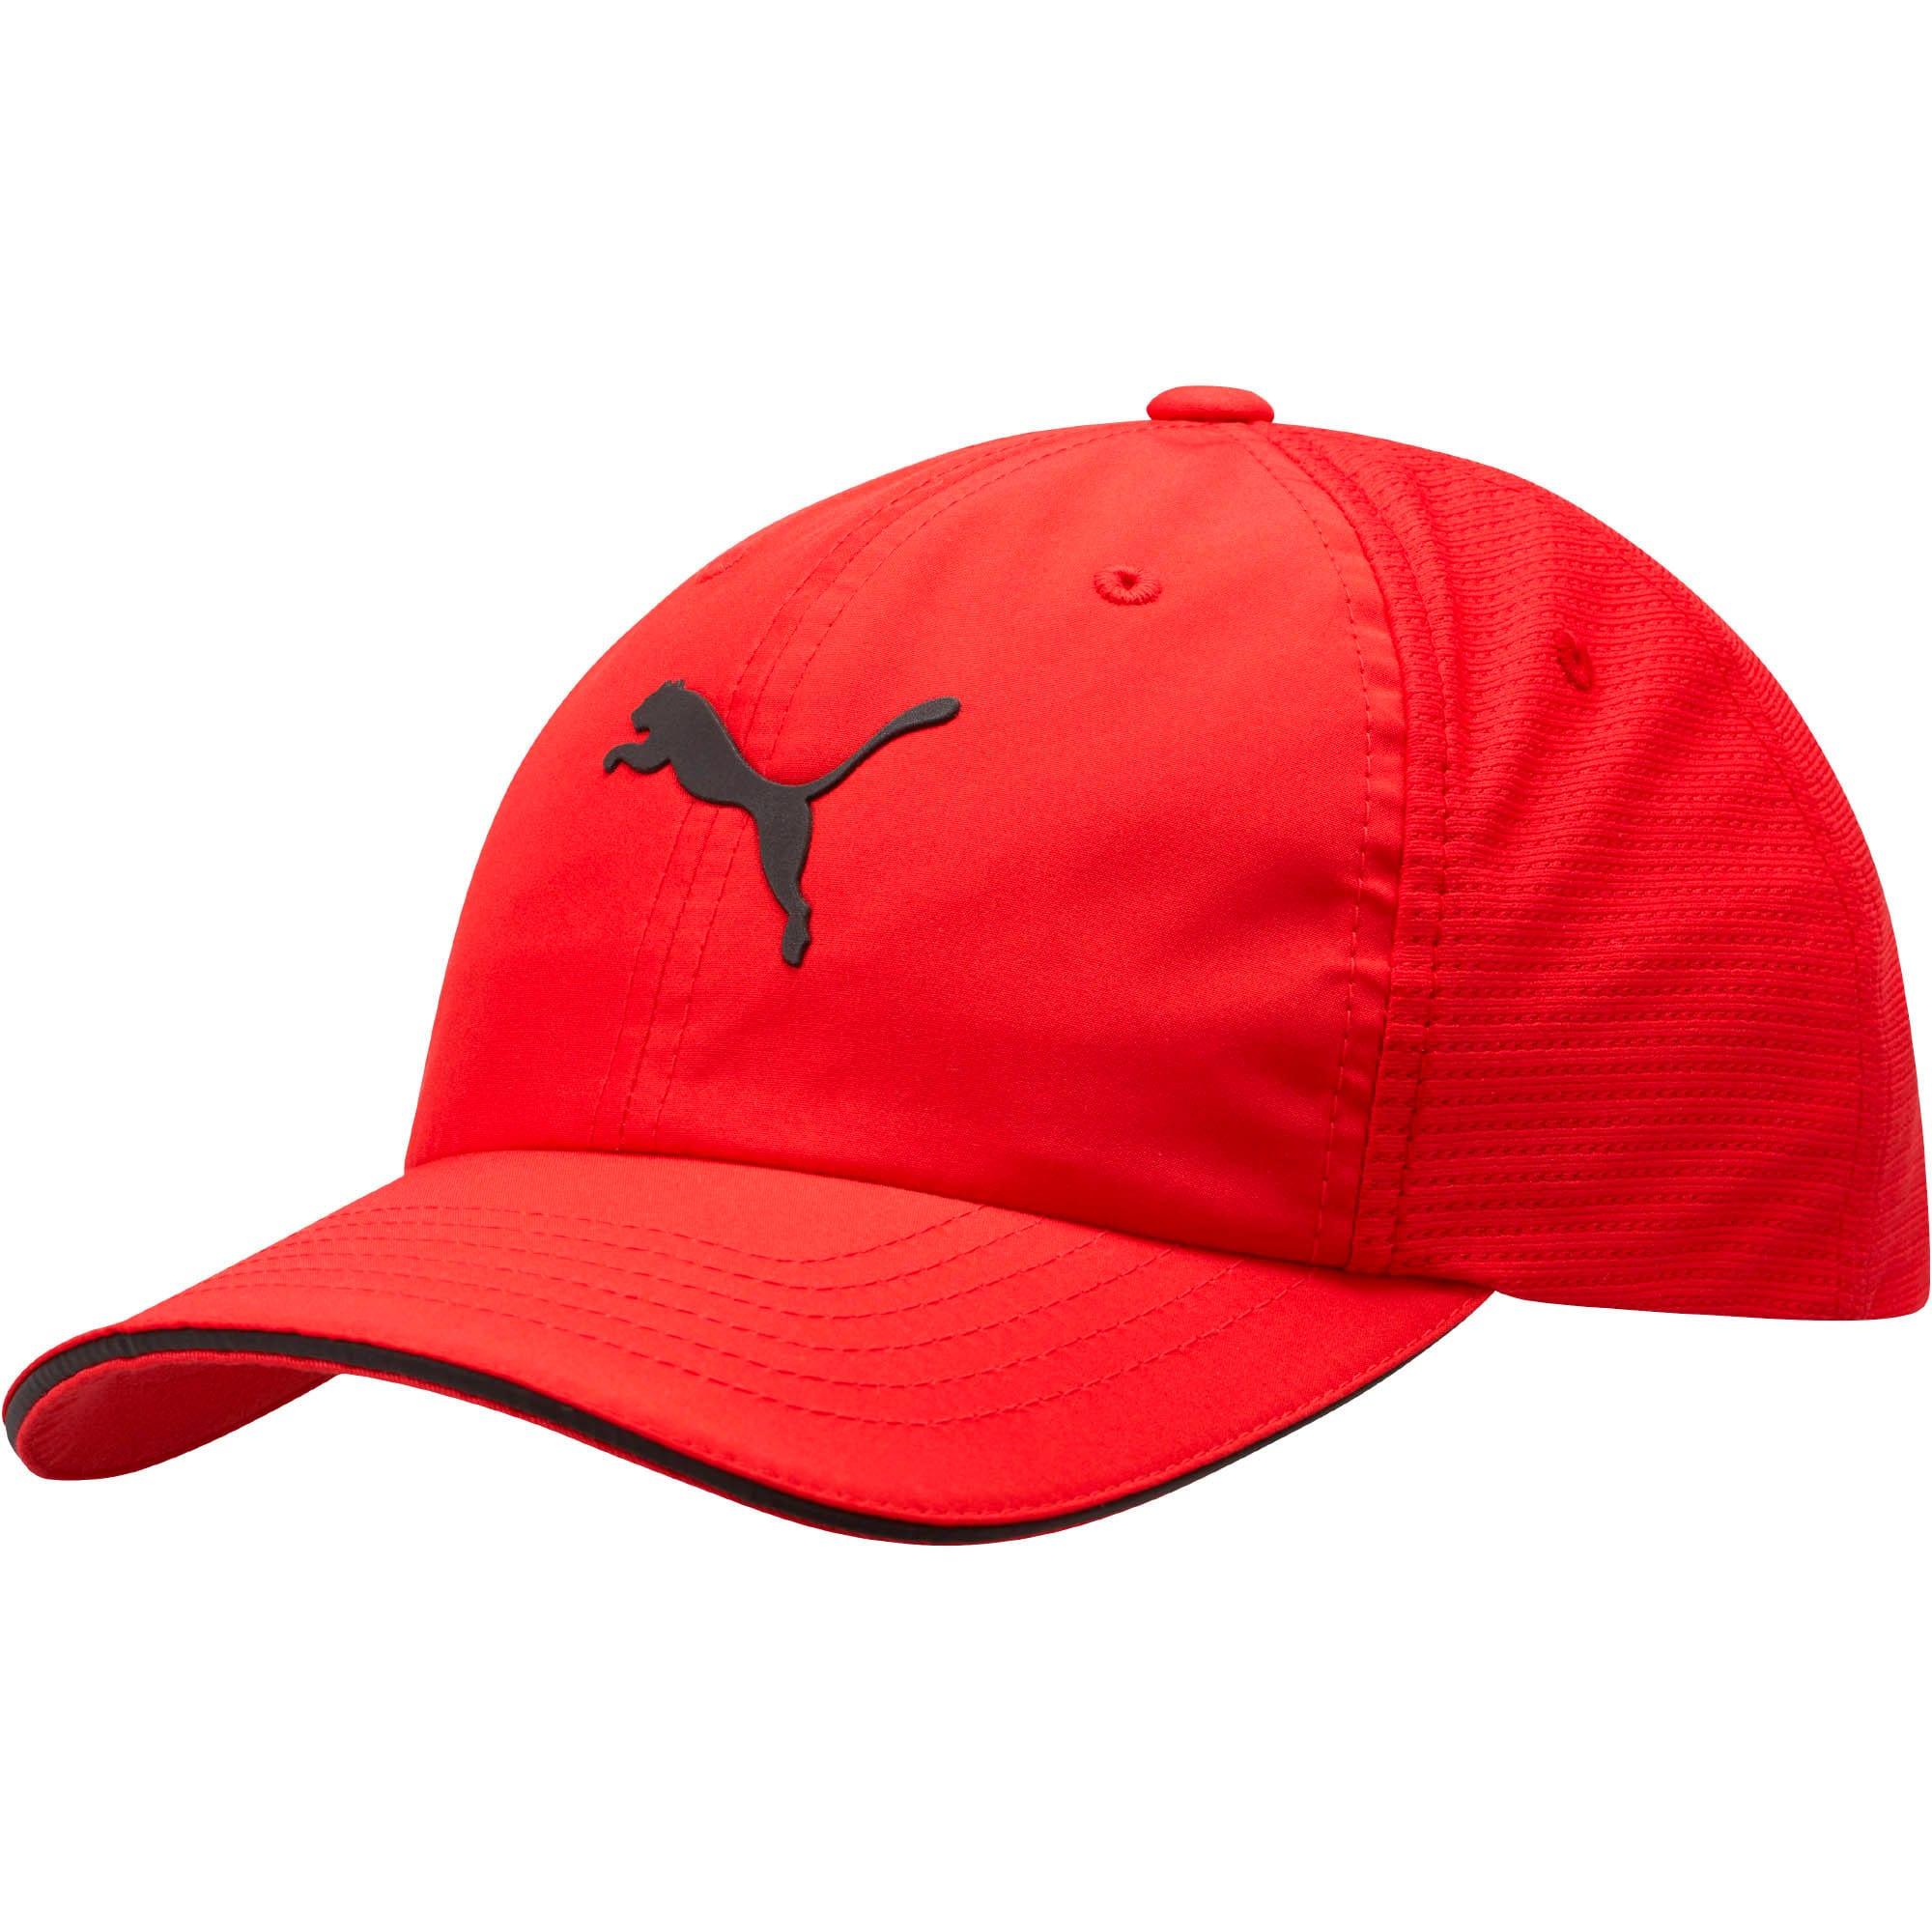 Thumbnail 1 of Mesh Running Hat, Red/Black, medium